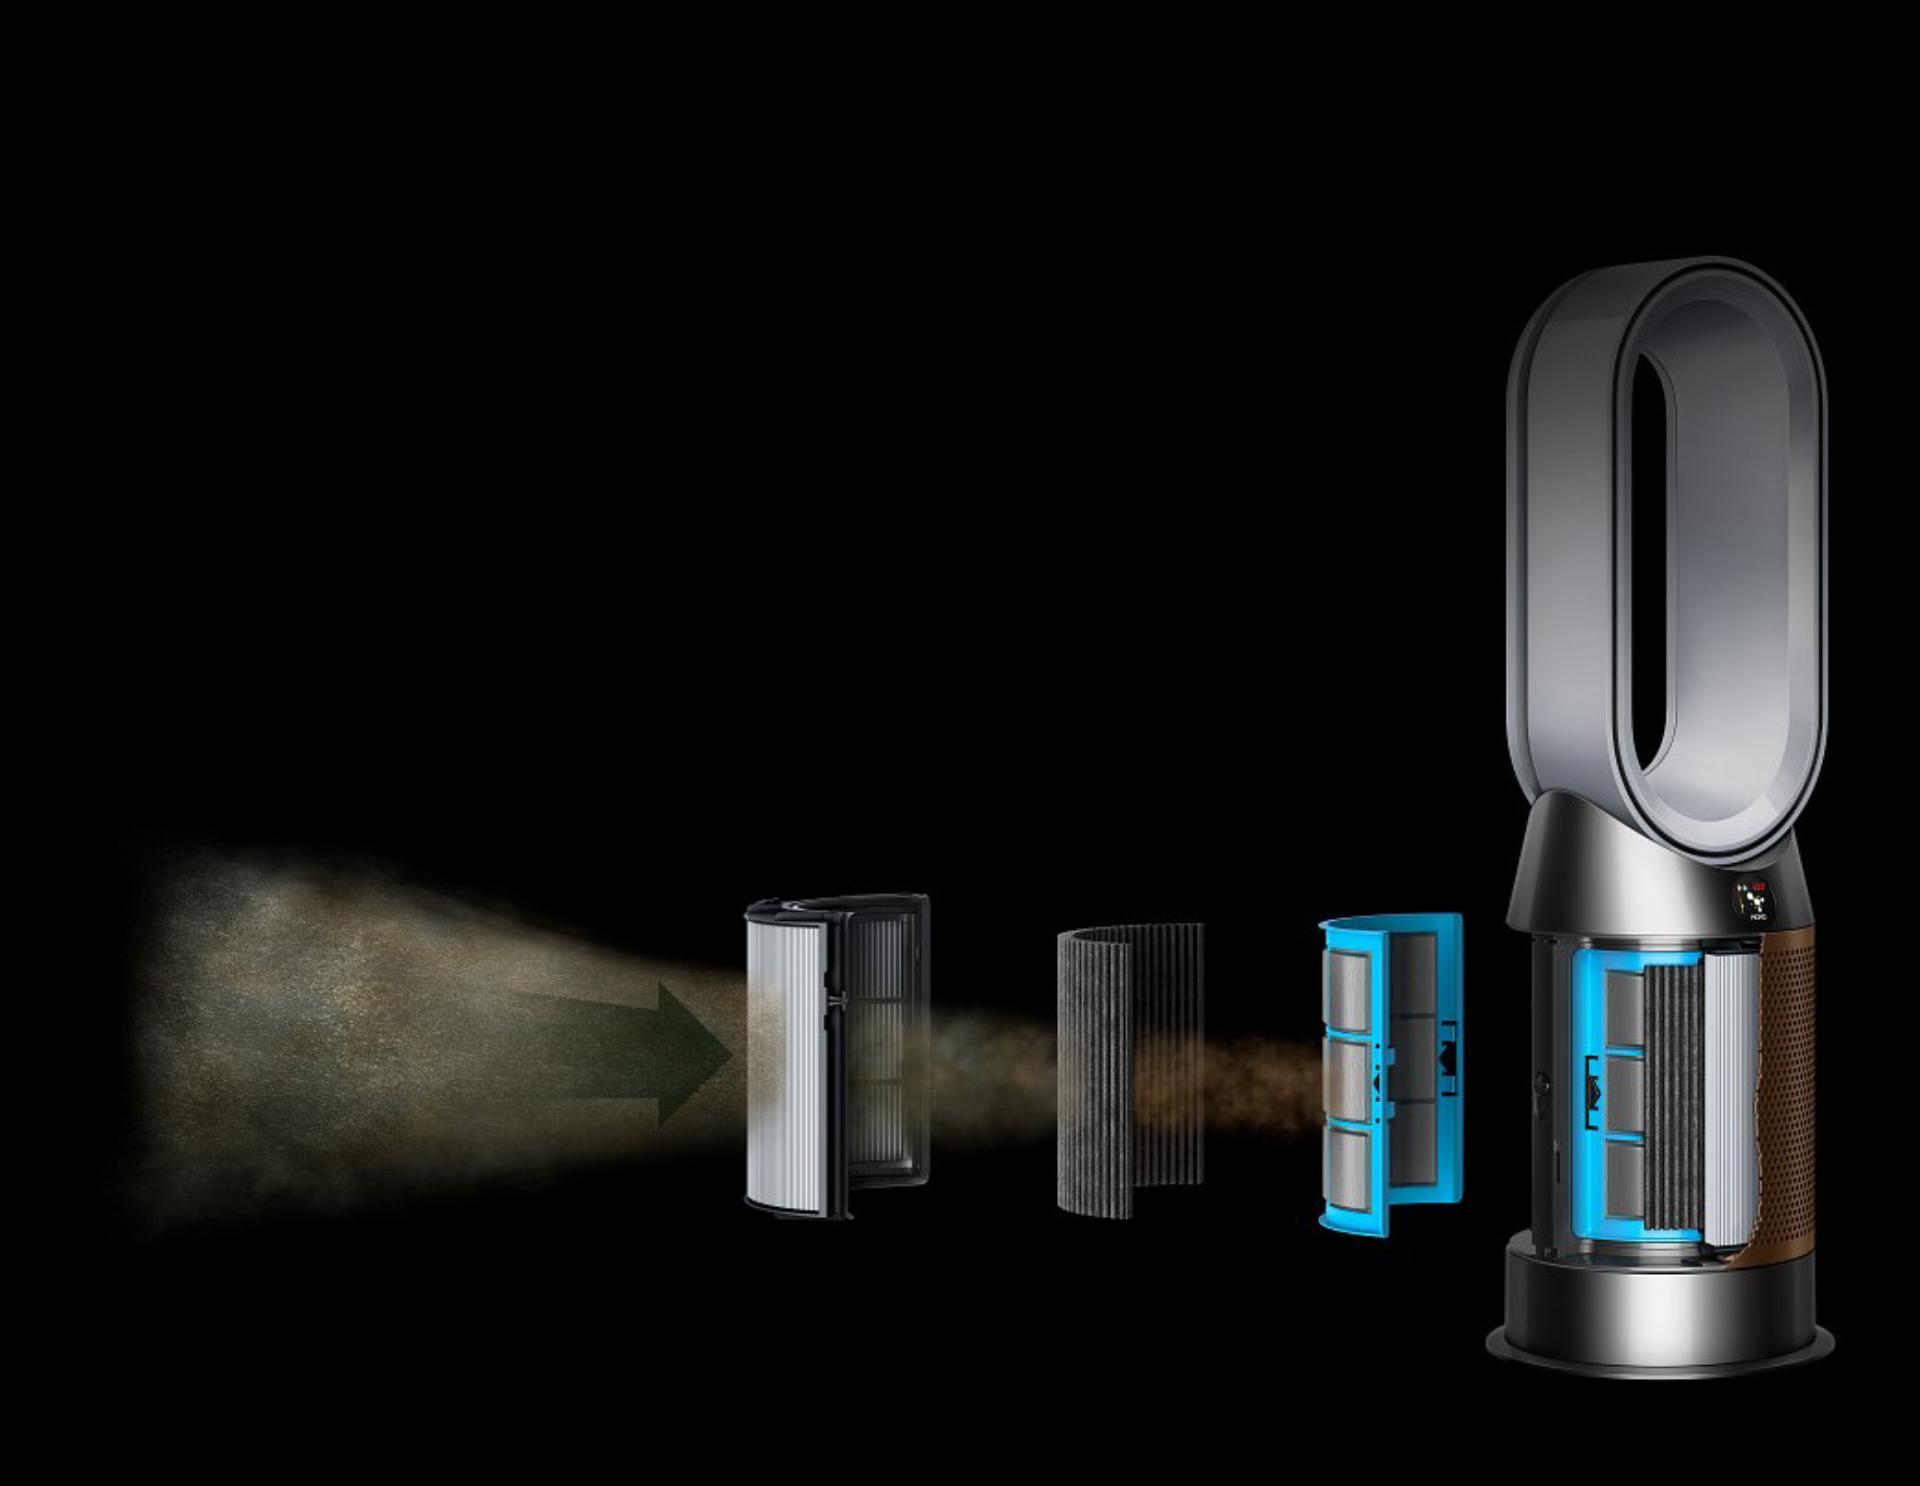 Dyson Launches Air Purification